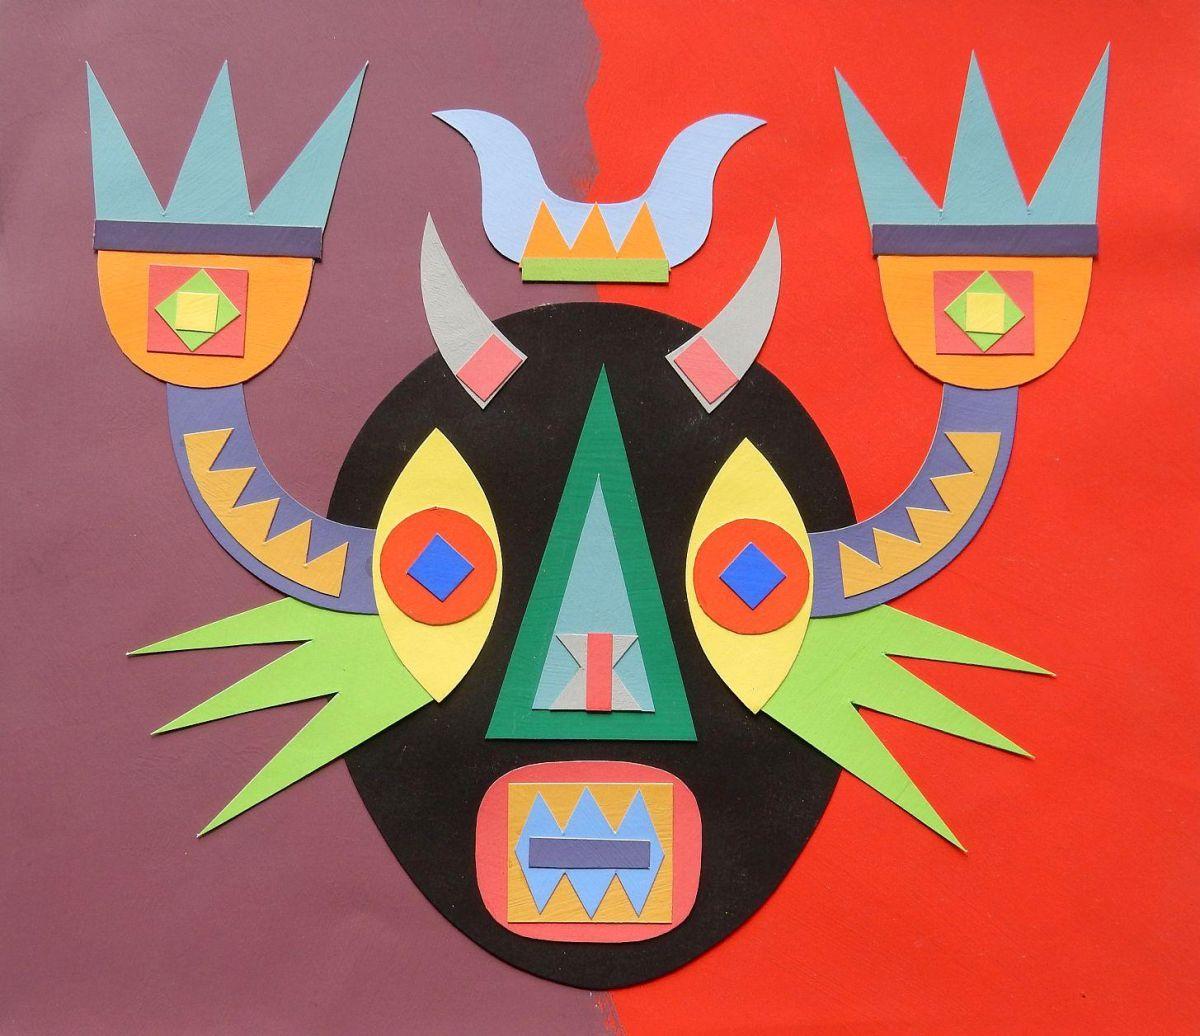 Herbert Rodriguez - Maske, Collage, 19,5x23 cm, ohne Jahr, Unikat kopen? Bied vanaf 290!